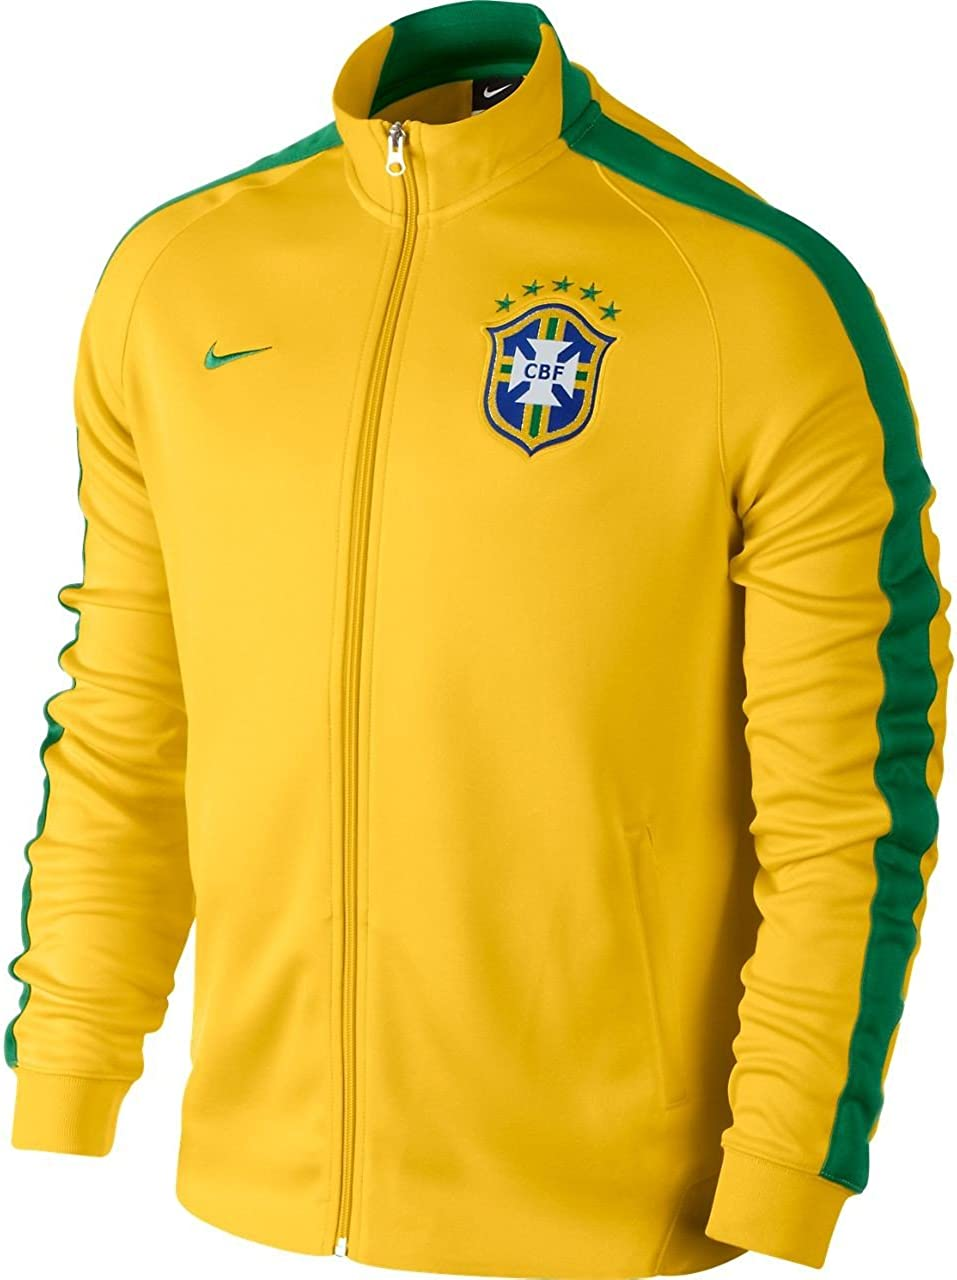 Nike Men's N98 Regular store Brazil Authentic Ranking TOP17 Jacket Track